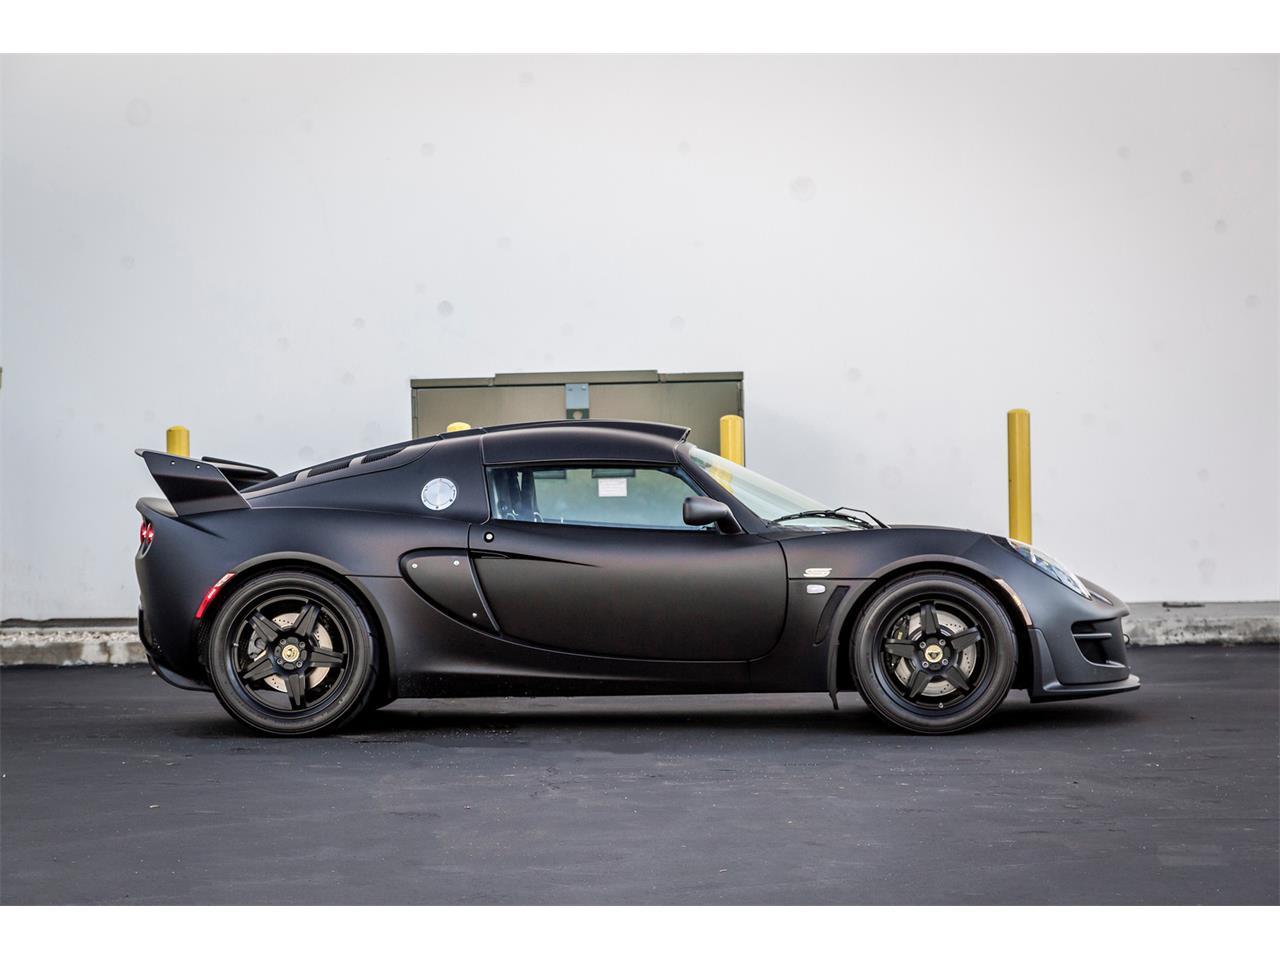 Large Picture of '11 Lotus Exige - $89,950.00 - LA12